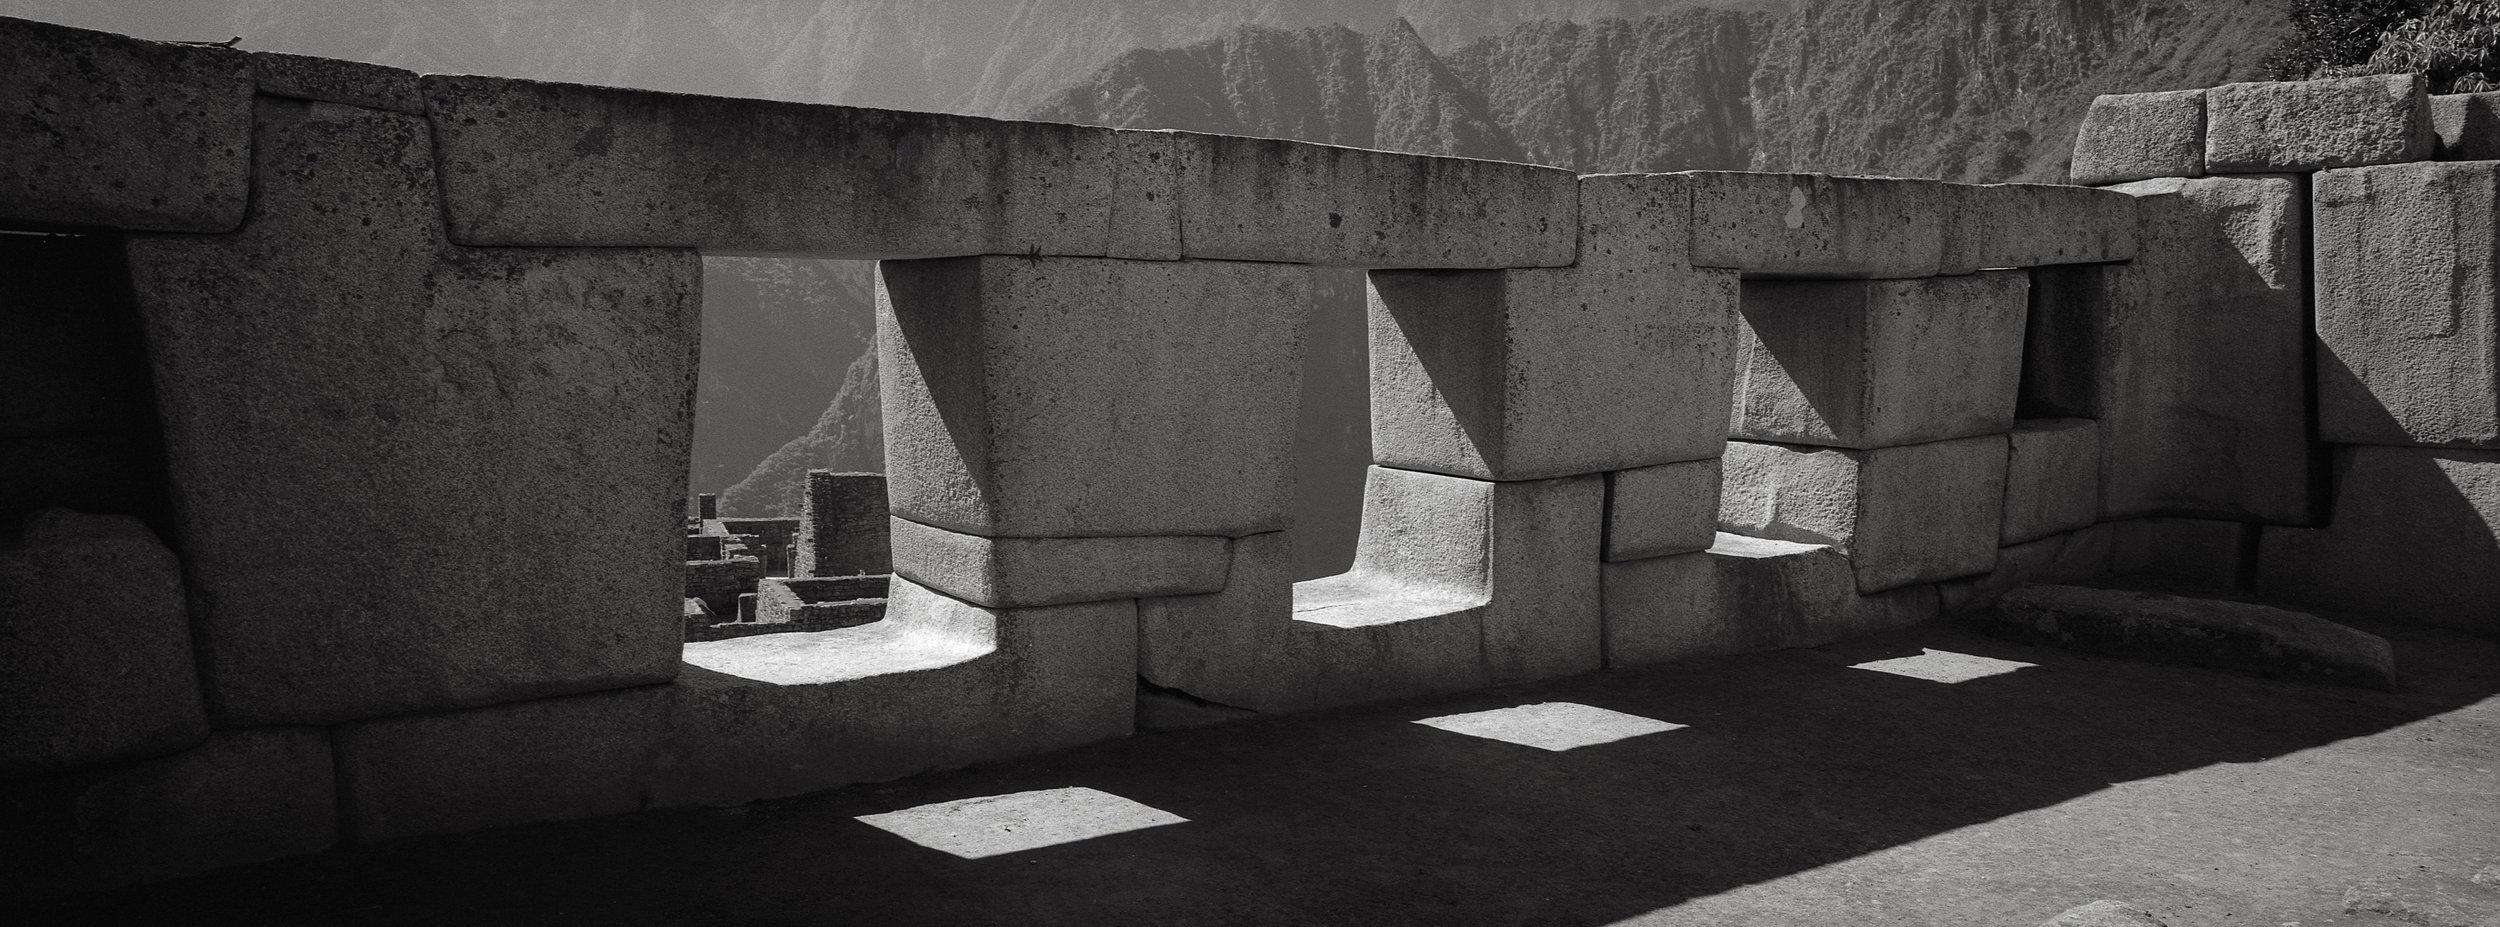 The Temple of the Three Windows, Machu Picchu